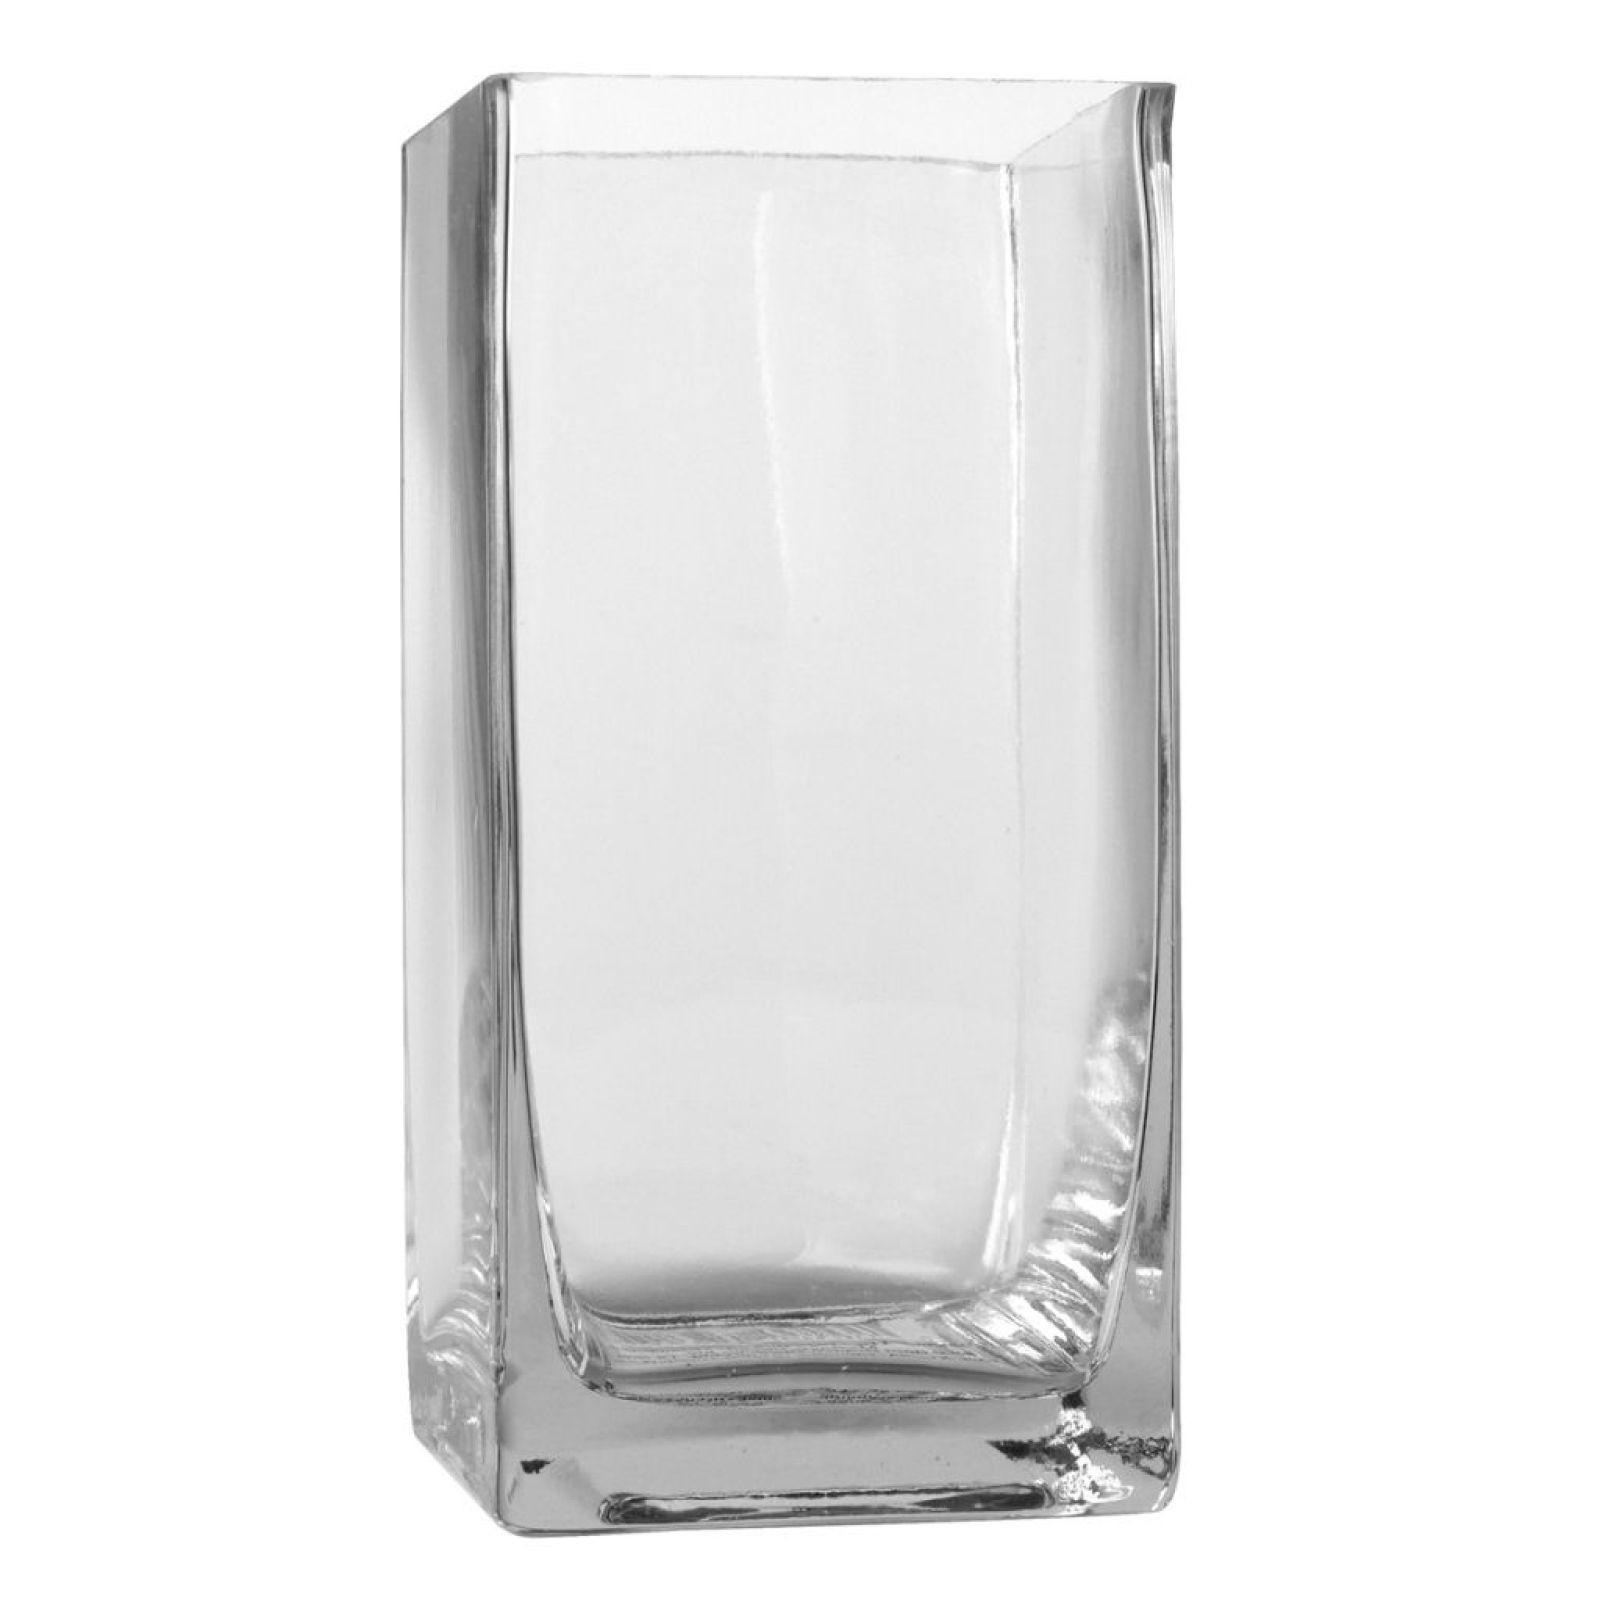 glass pillar vase by ashland of ashland tall cube glass vase cube and glass throughout ashlanda tall cube glass vase 6